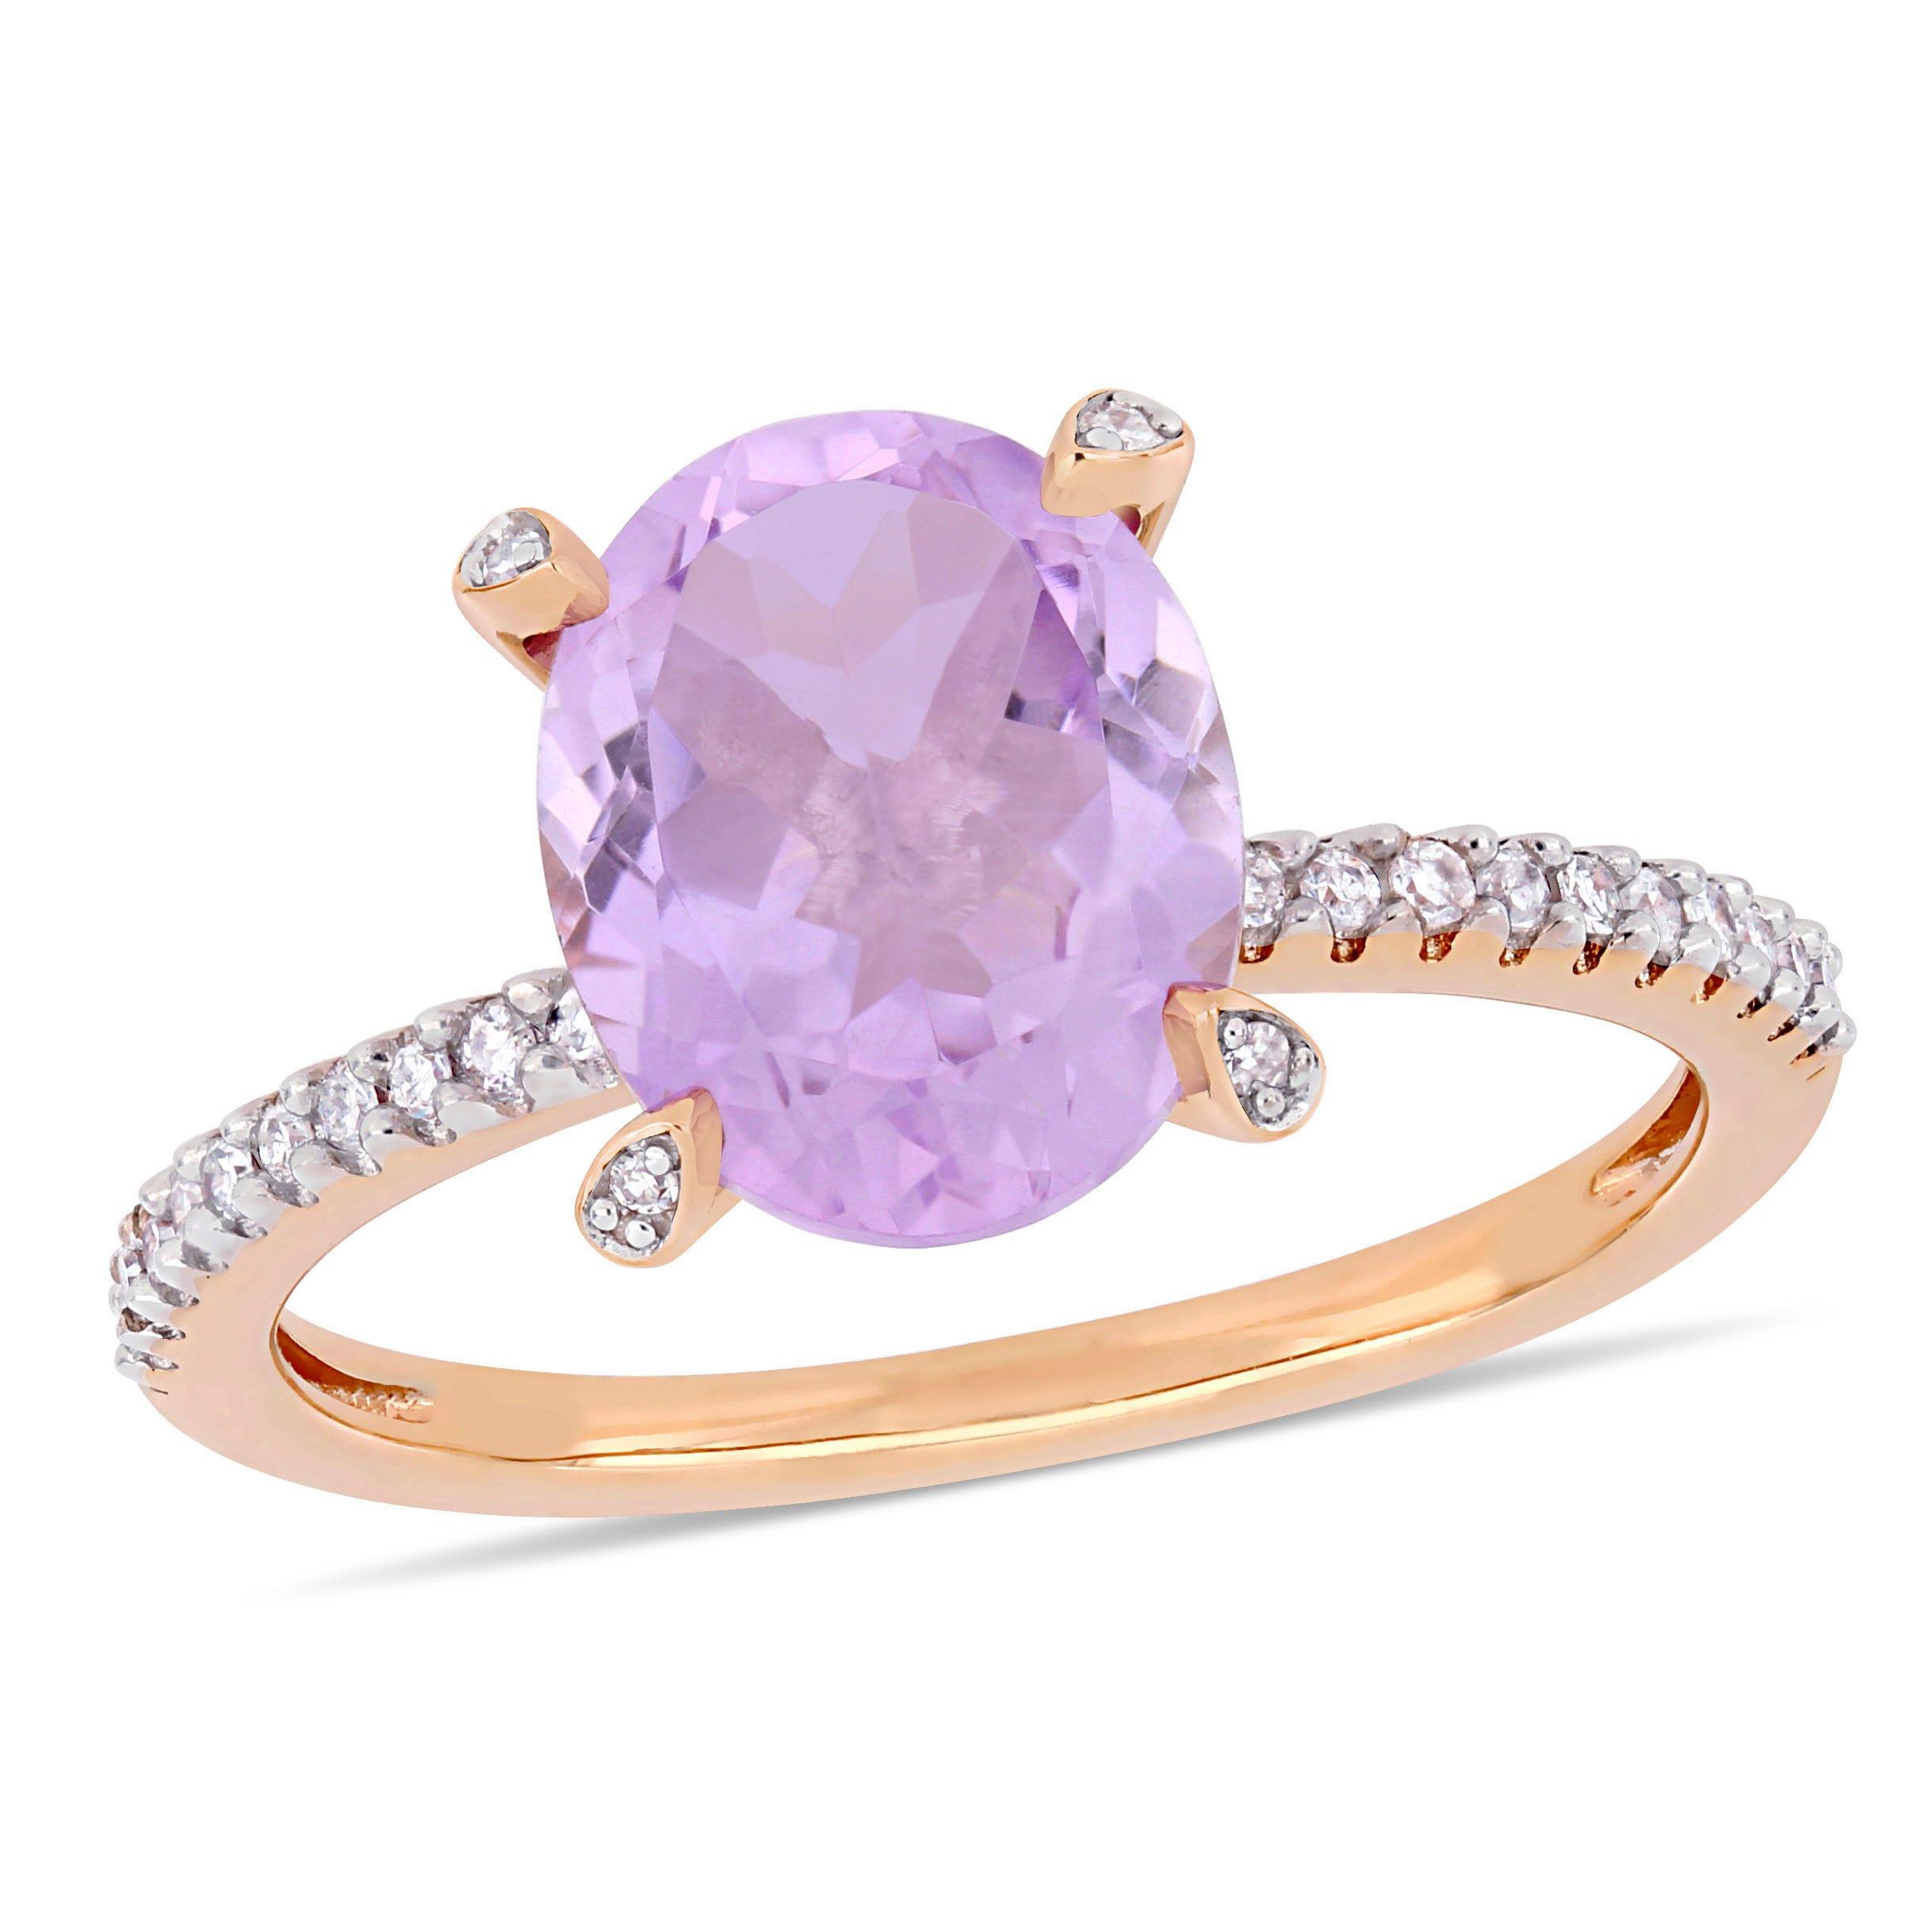 Oval Rose De France Gemstone & Diamond Engagement Ring in 10k Rose Gold